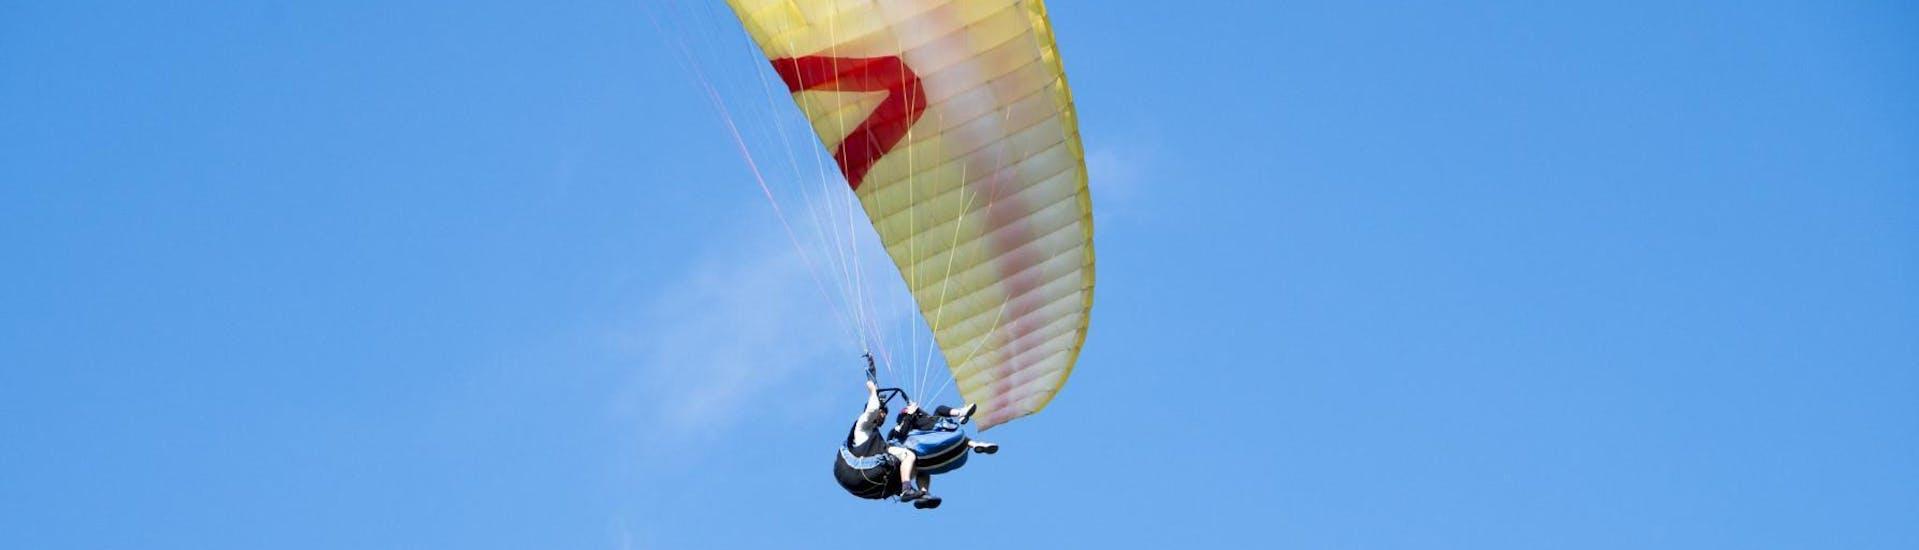 thermic-tandem-paragliding-on-the-dalmatian-coast-sky-riders-paragliding-croatia-hero